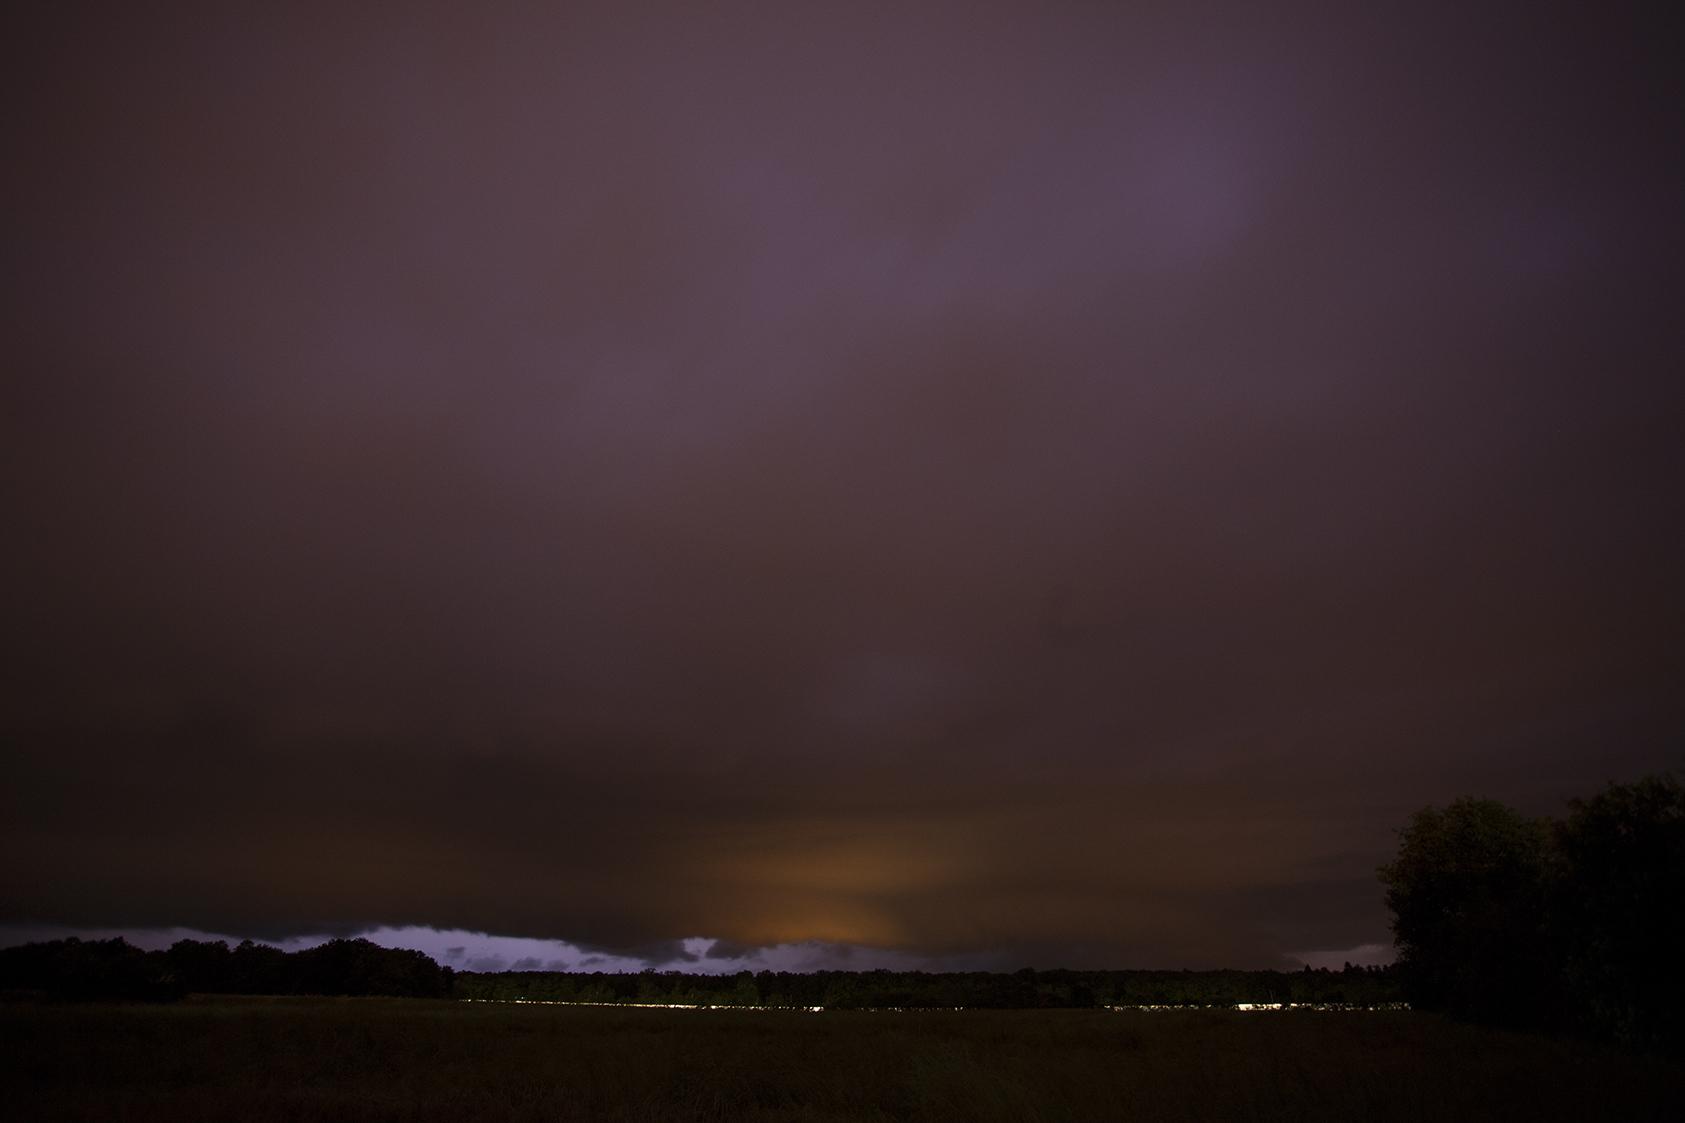 Night train from Paris to Lyon passing lightning storm